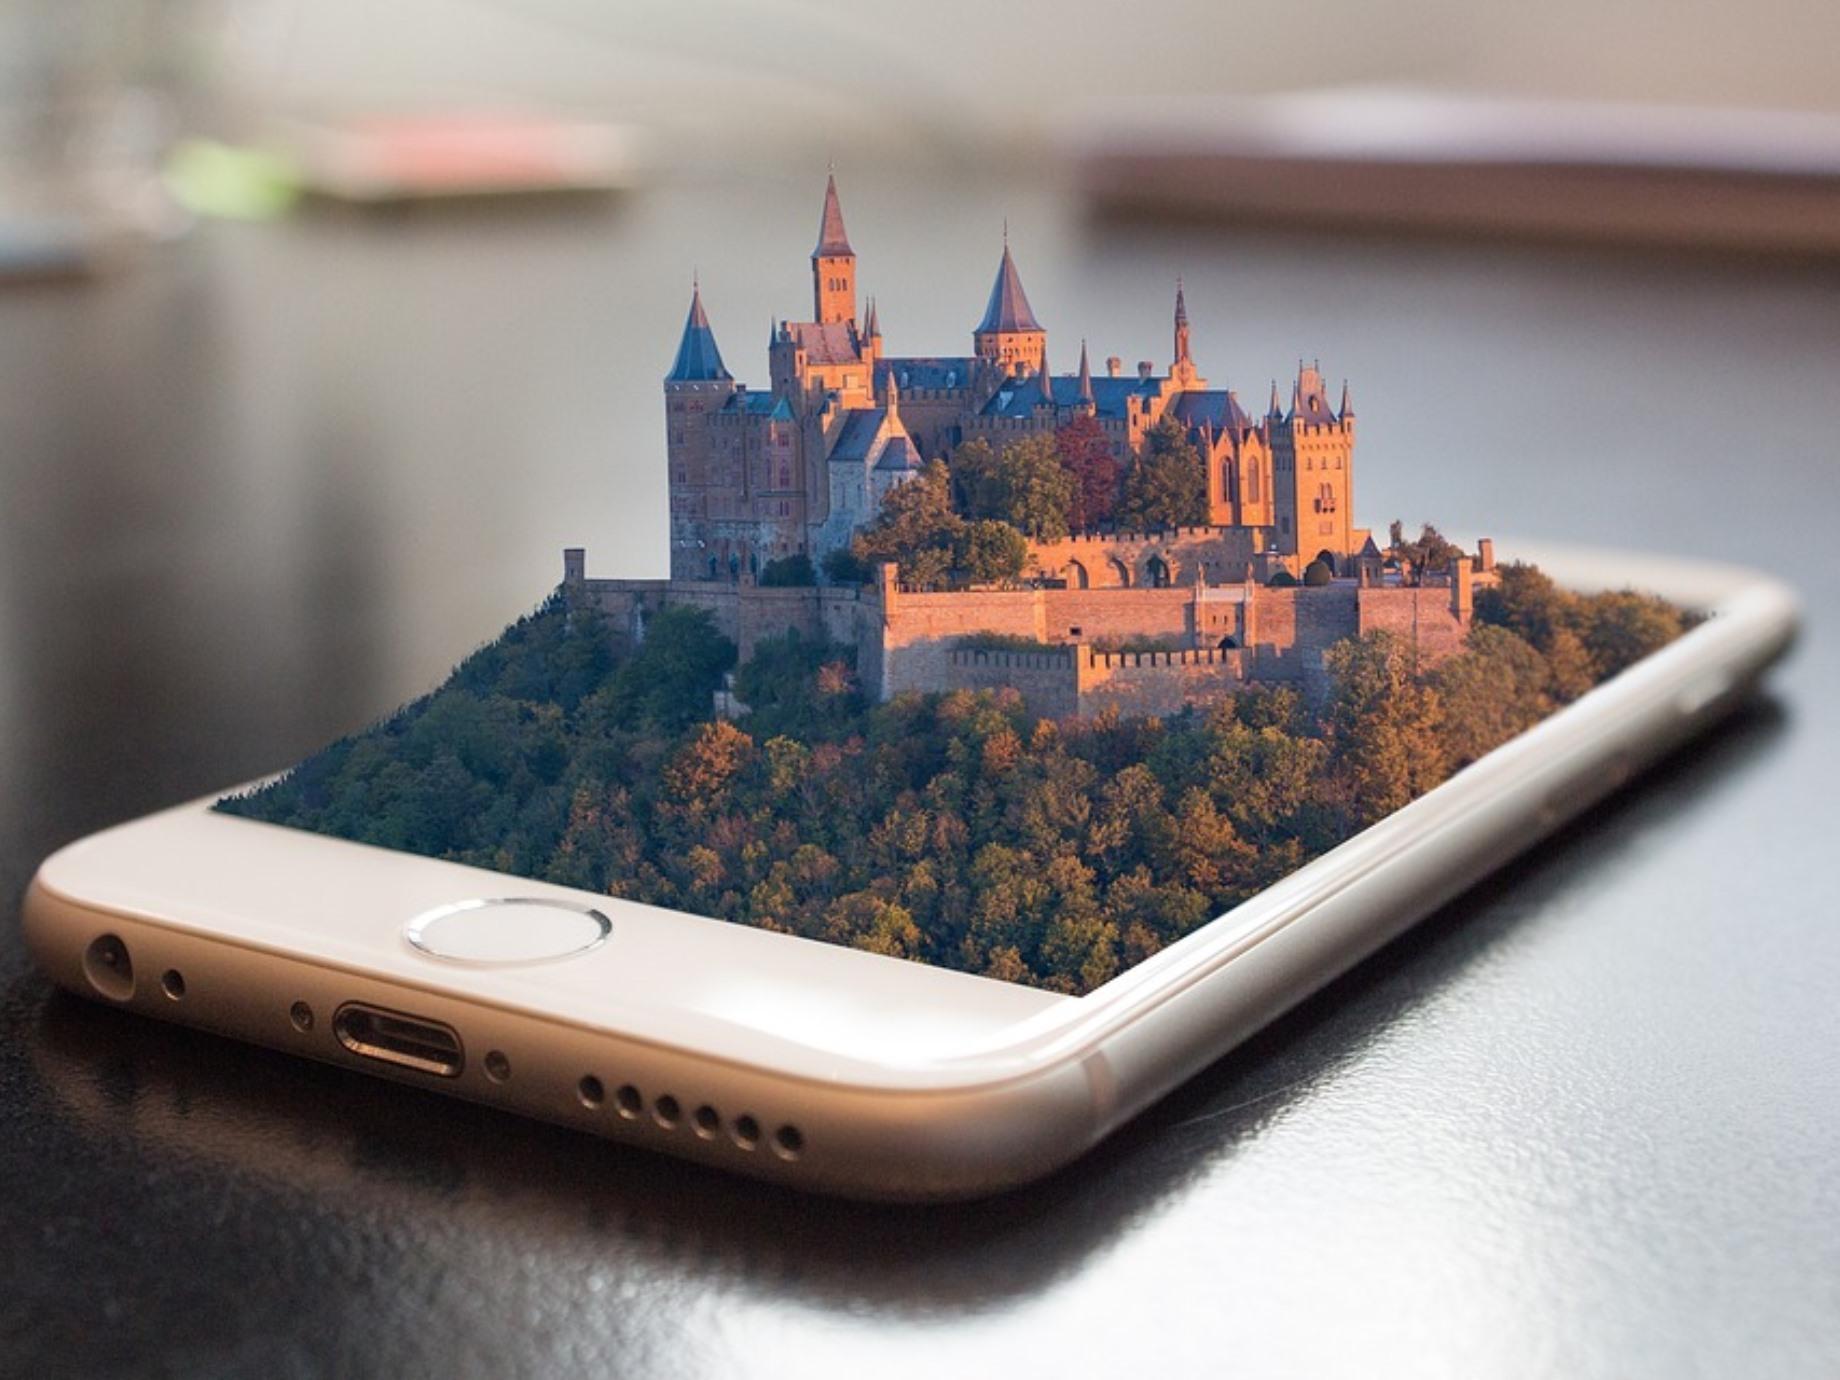 Flurry發表《2017 App年度關鍵報告》:App使用時間趨飽和、購物型應用大幅成長